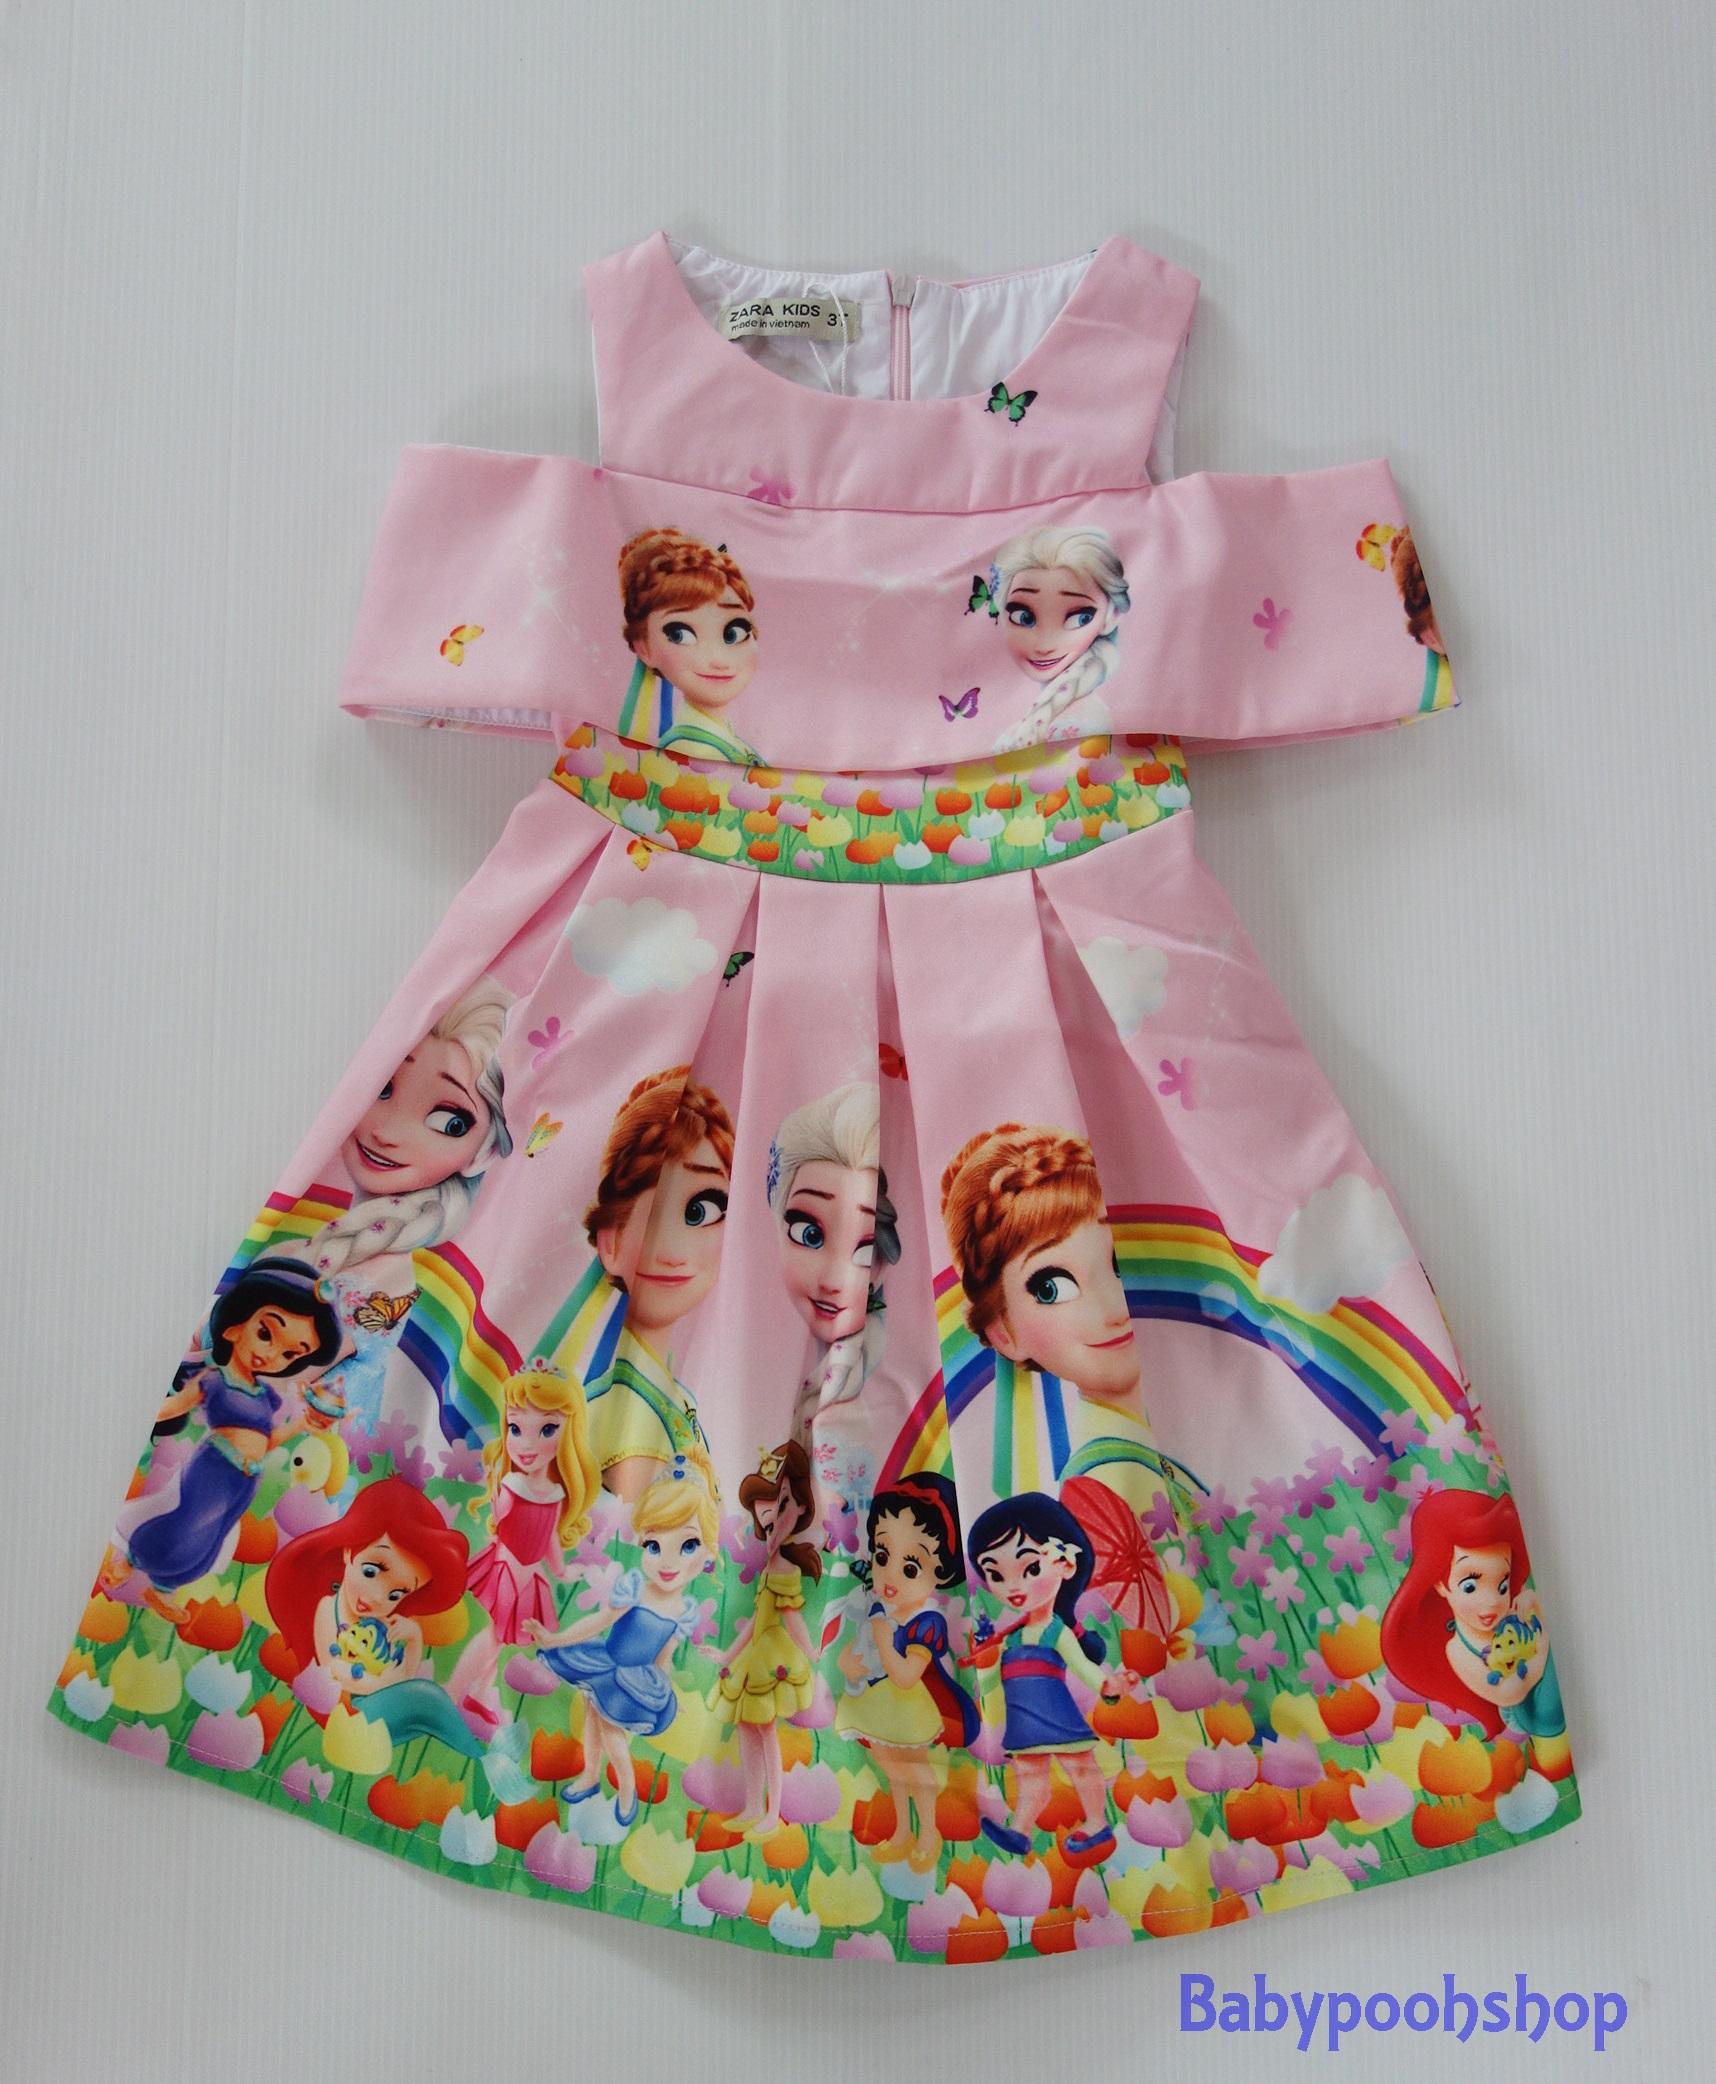 ZARA Kids : ชุดเดรสพิมพ์ลายเจ้าหญิง สีชมพูหวาน size : 3T (1-2y) / 5T (3-4y) / 6T (4-6y) / 7T (6-8y) / 9T (8-10y) / 11T (11y) / 12T (12-13y) / 13T ( 14y)